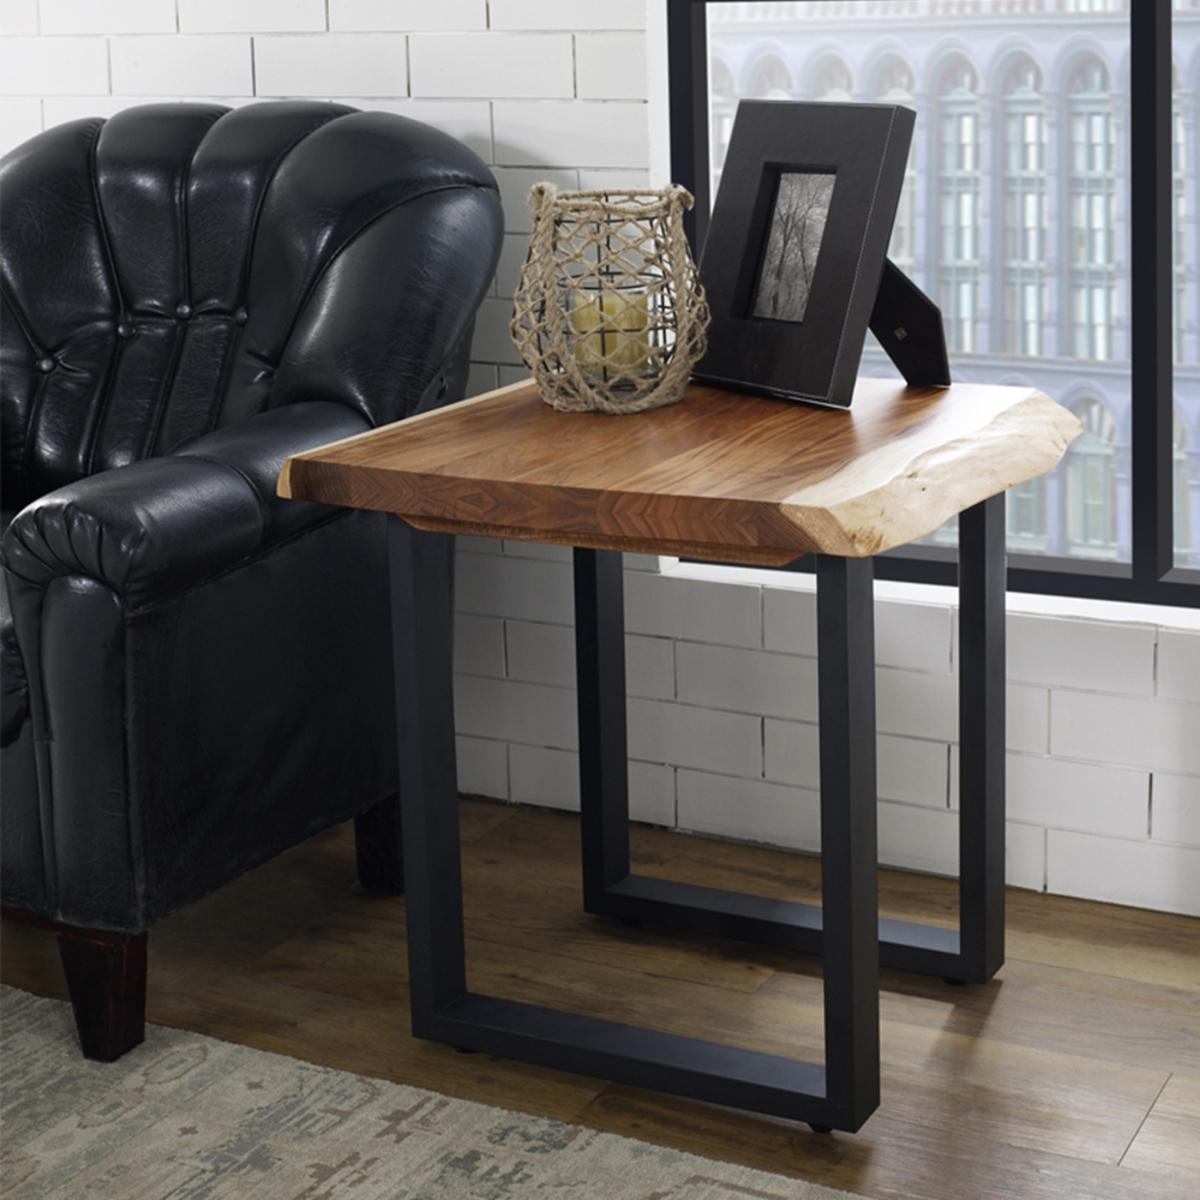 LFN實木造型邊桌